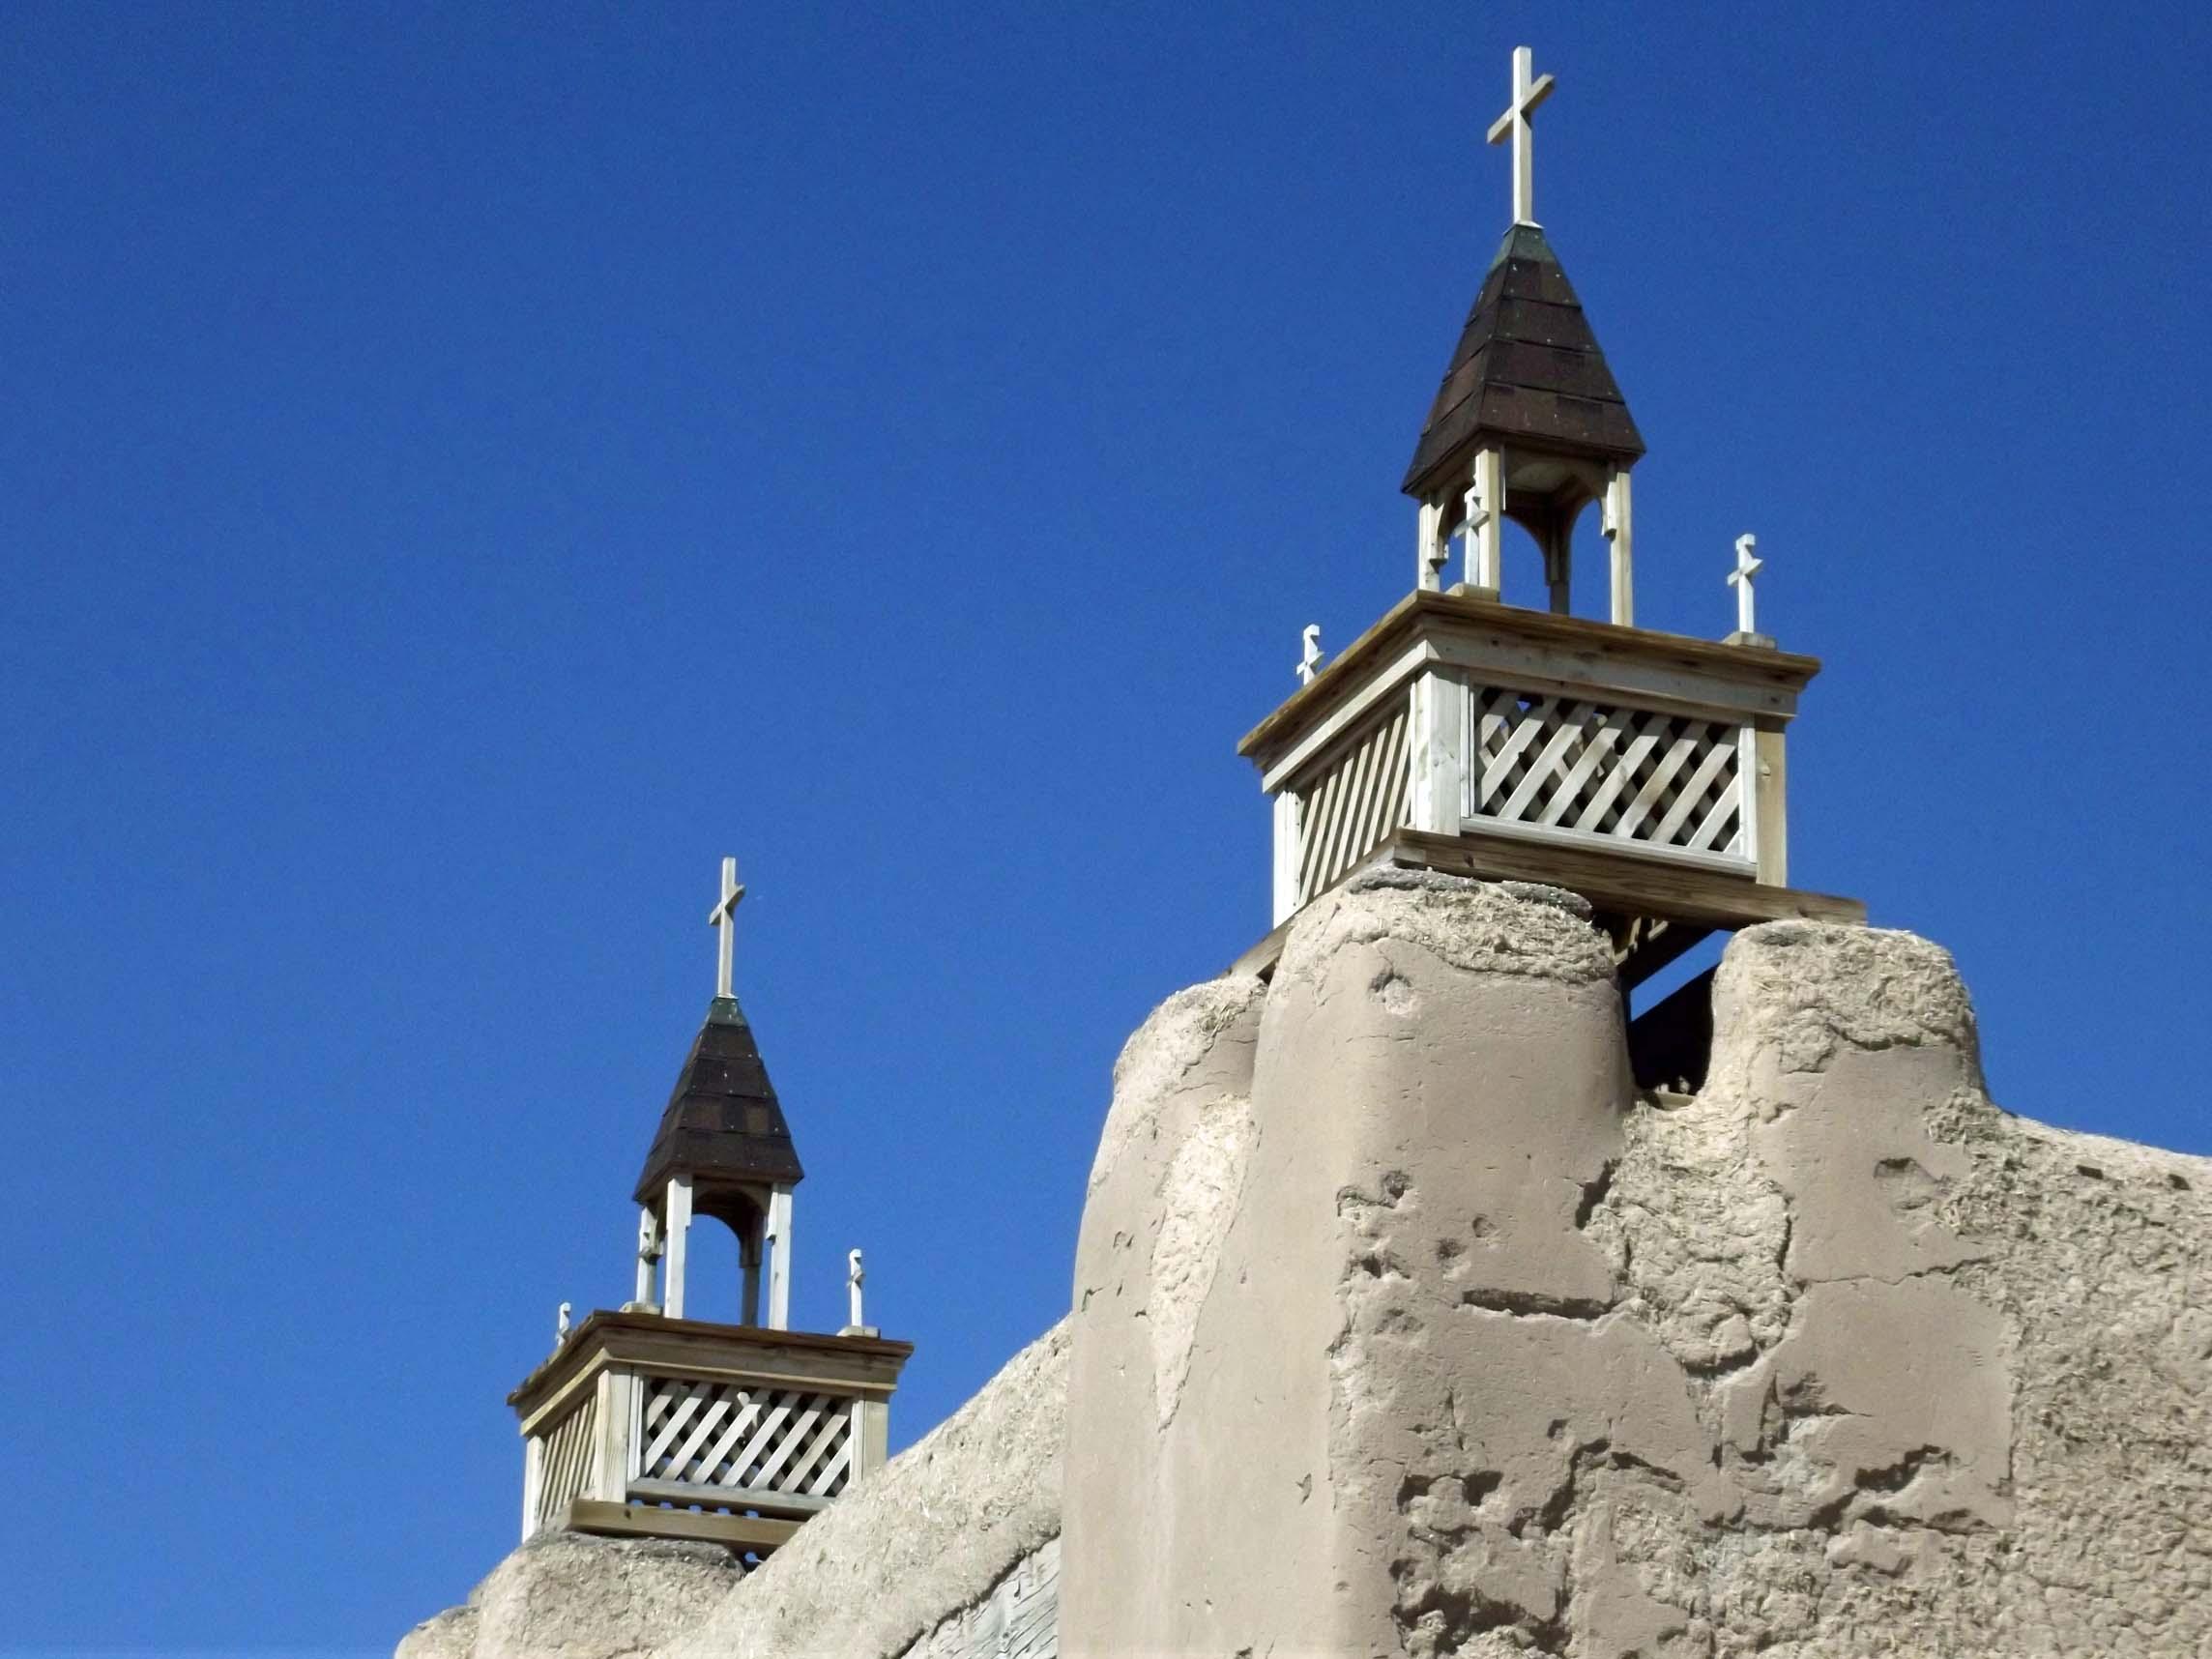 Towers of an adobe church